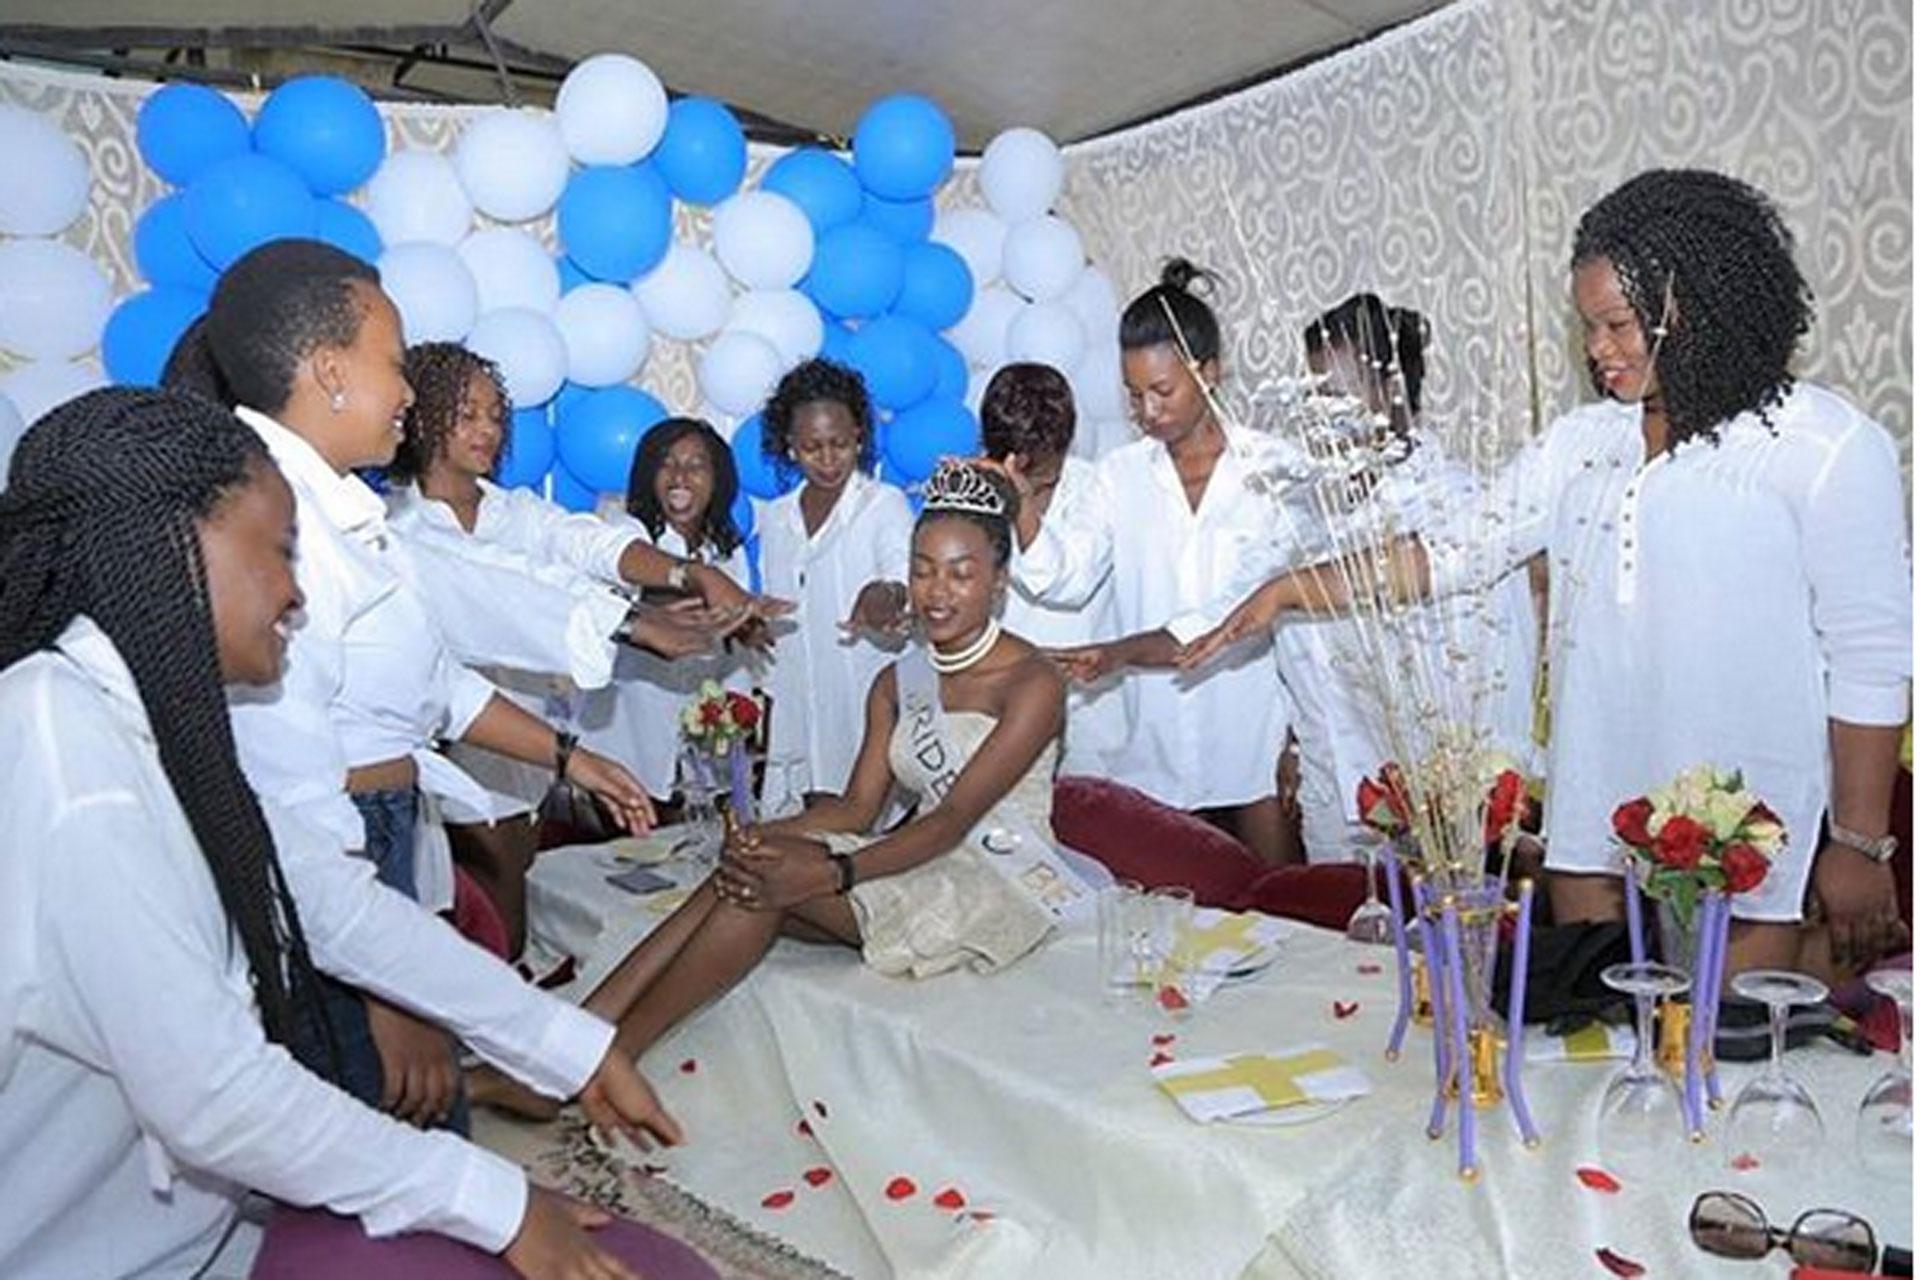 How To Plan A Bridal Shower My Wedding For Fashion Uganda Wedding Kwanjula And Kuhingira Budget Ideas